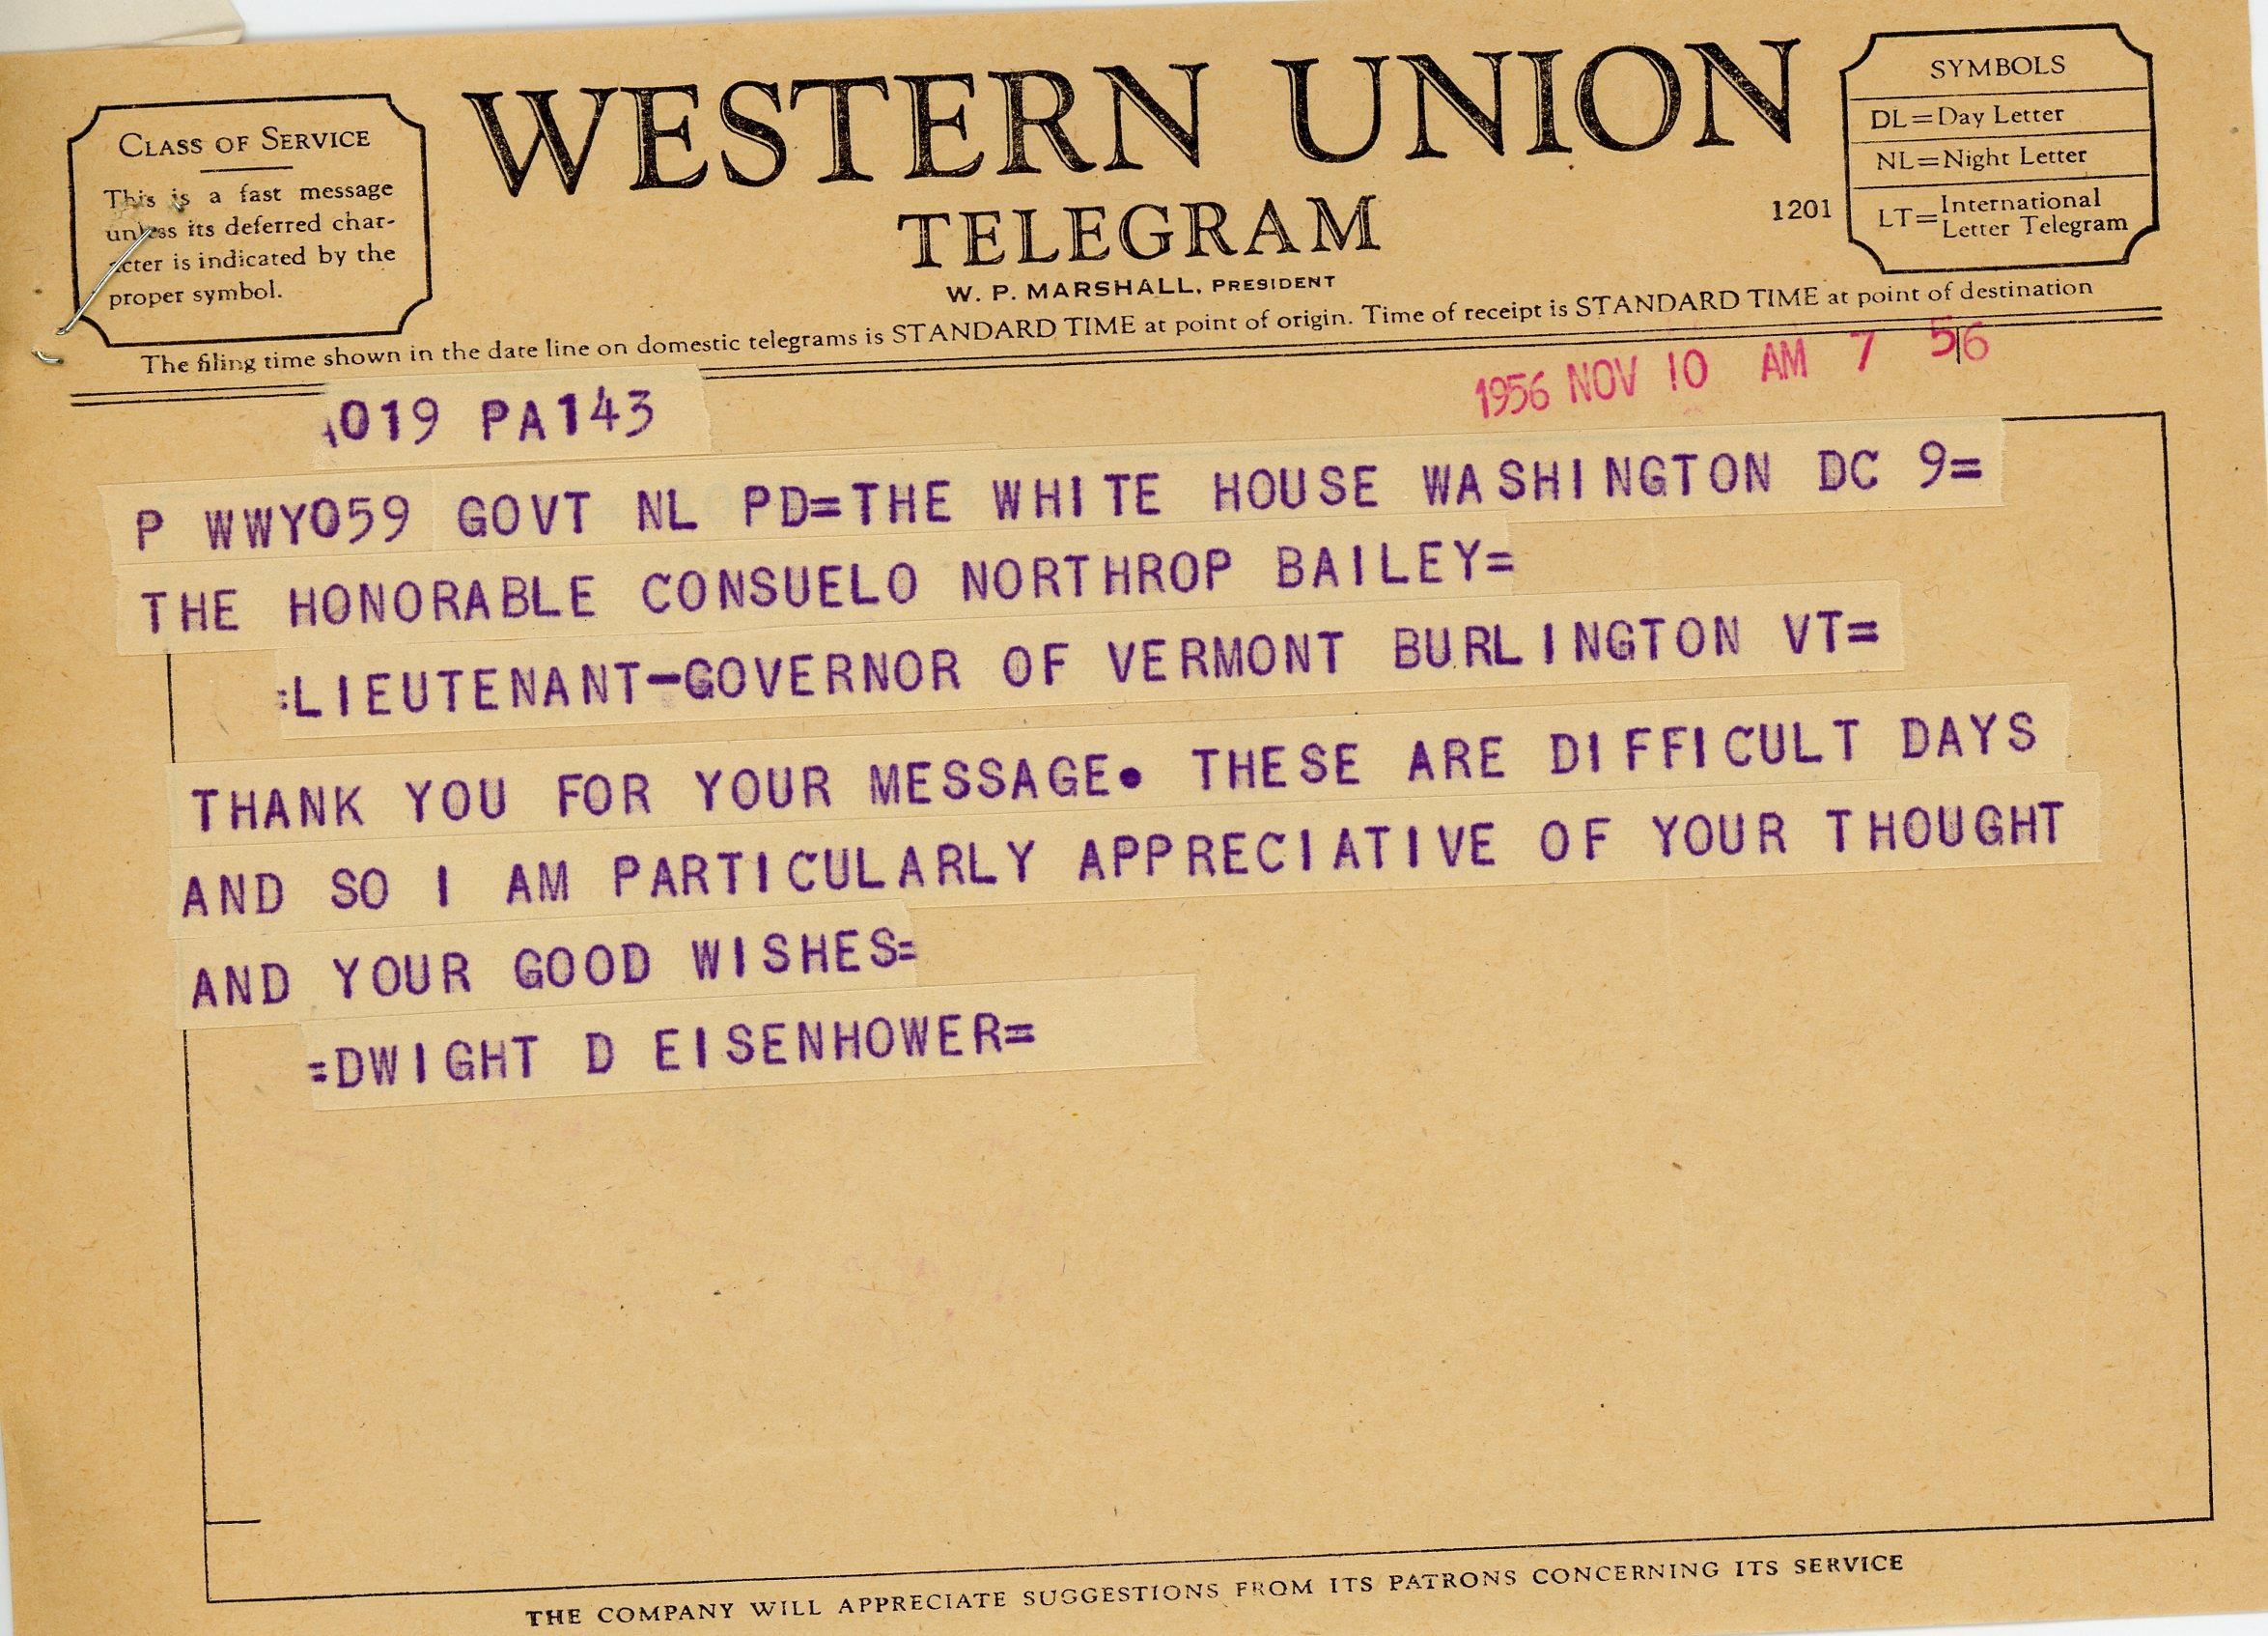 President Dwight D. Eisenhower to Consuelo Northrop Bailey, 1956, November 10